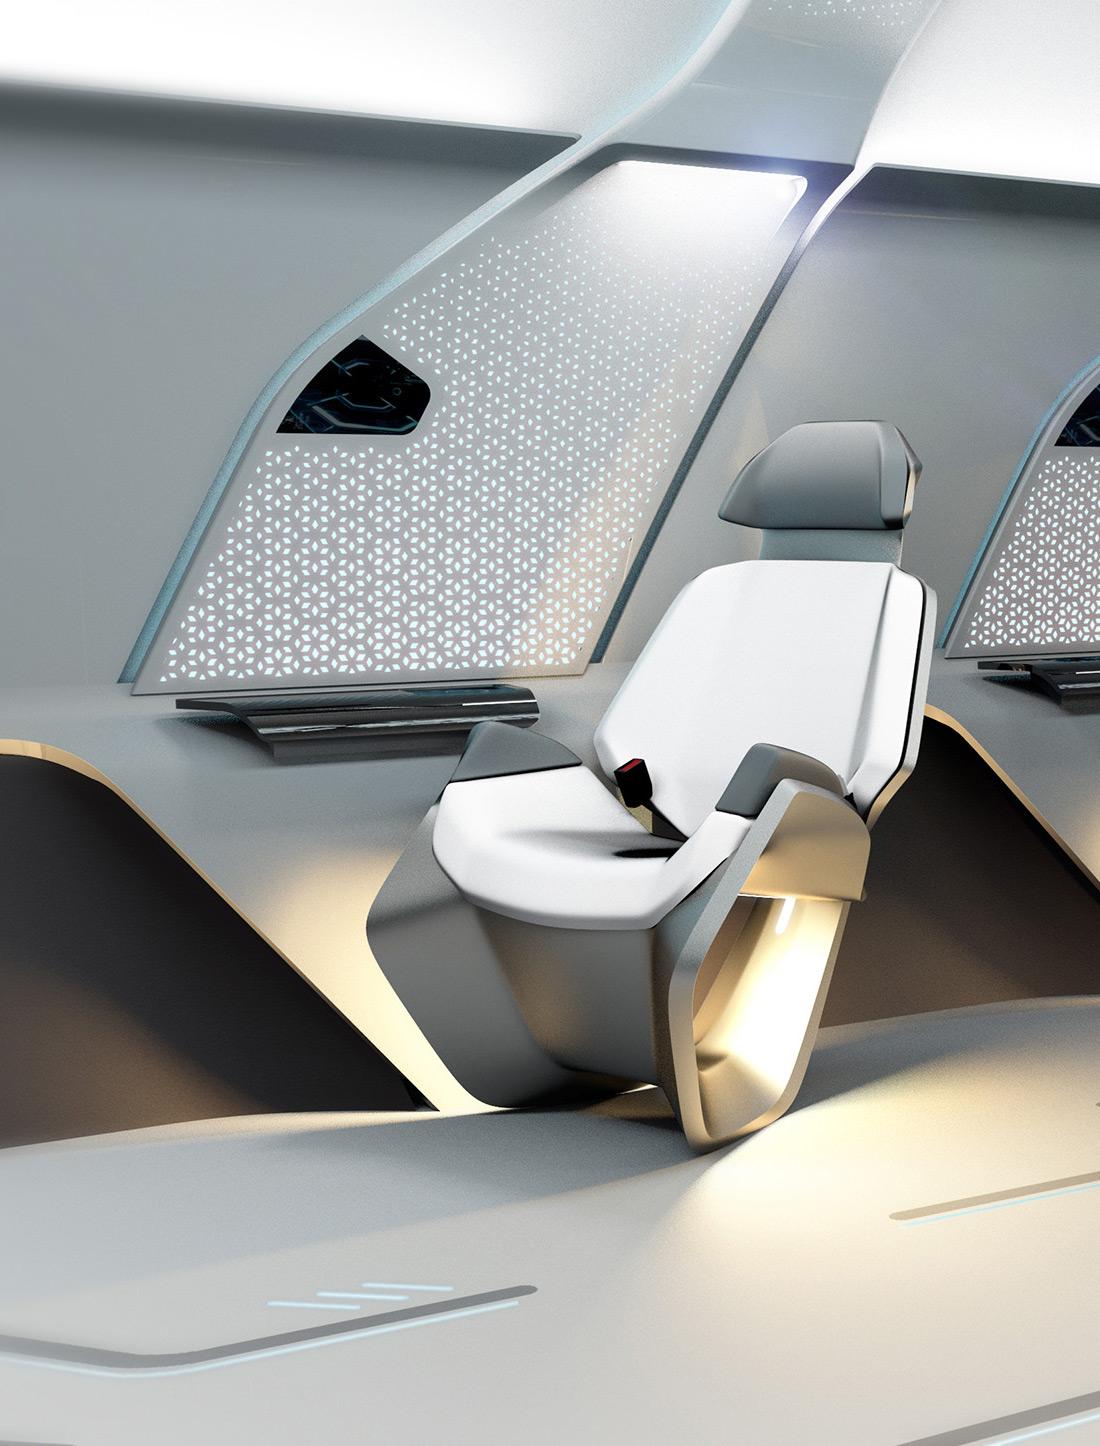 hyperloop one seat close up